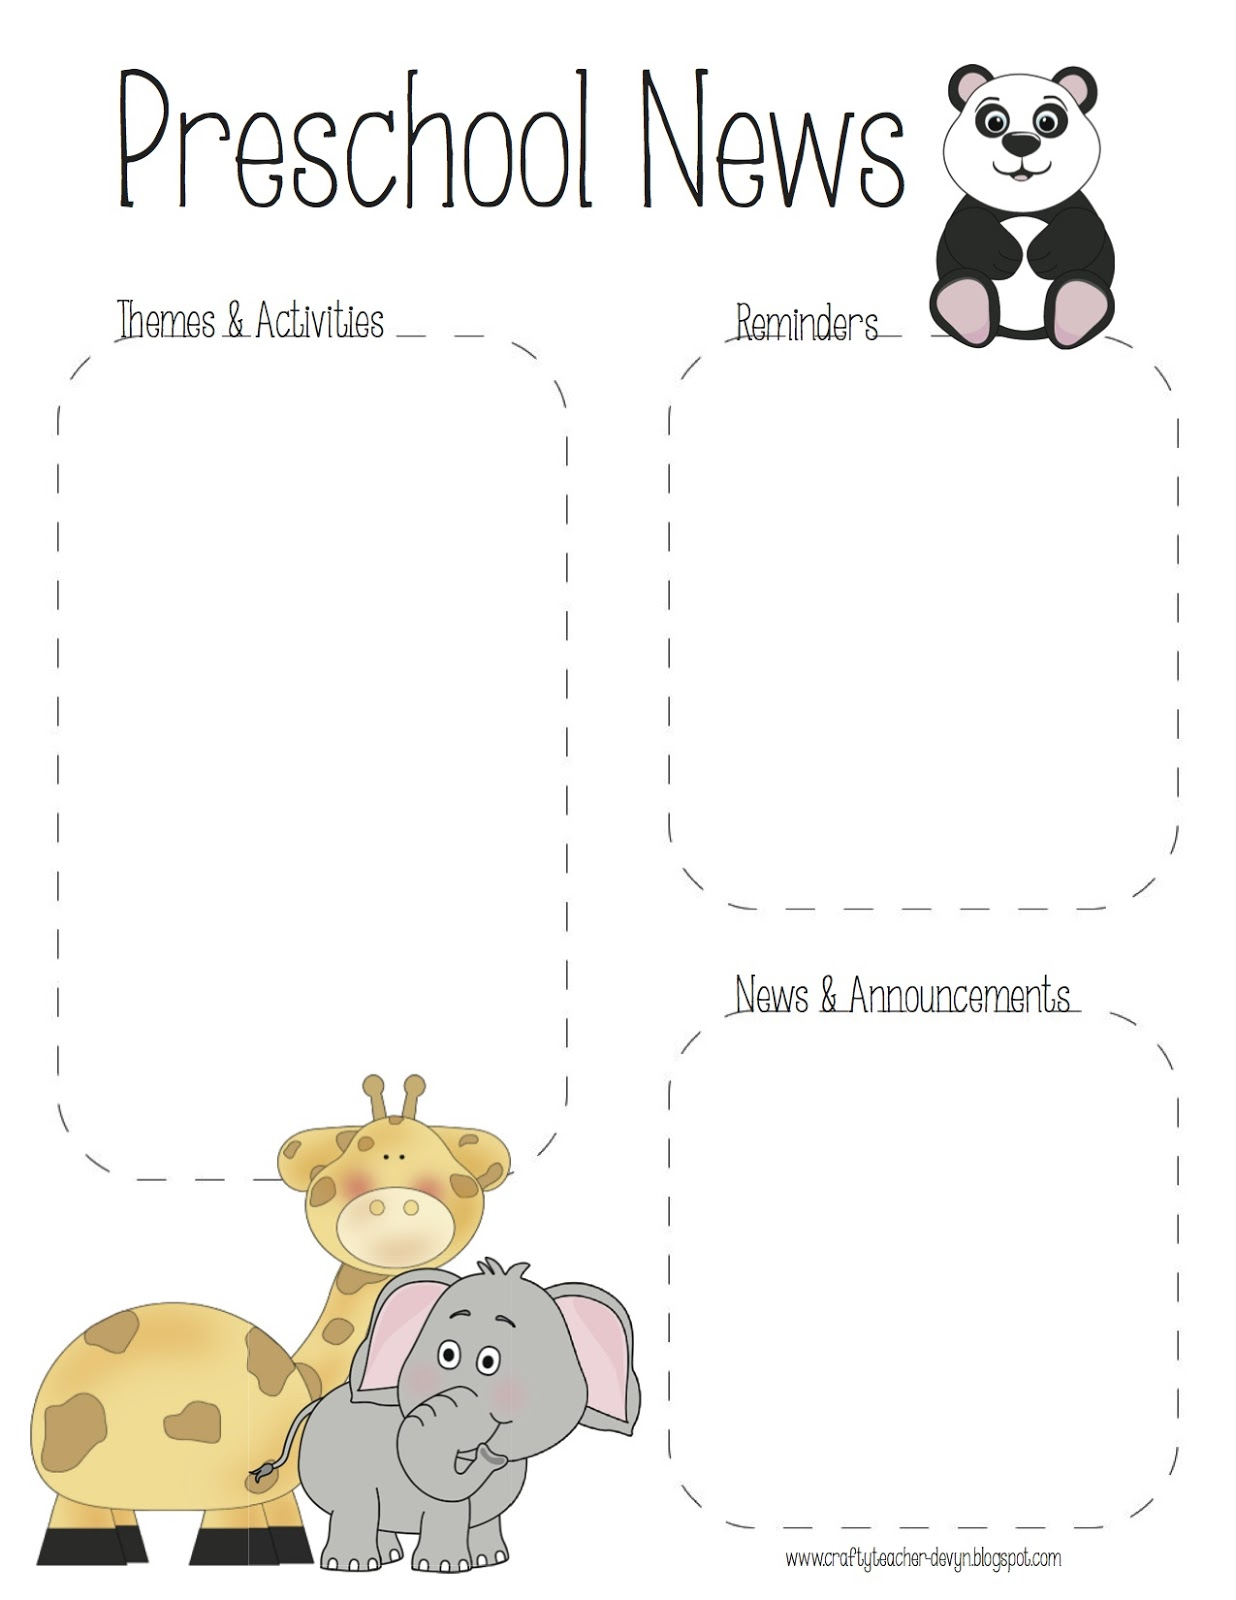 preschool zoo newsletter template the crafty teacher. Black Bedroom Furniture Sets. Home Design Ideas